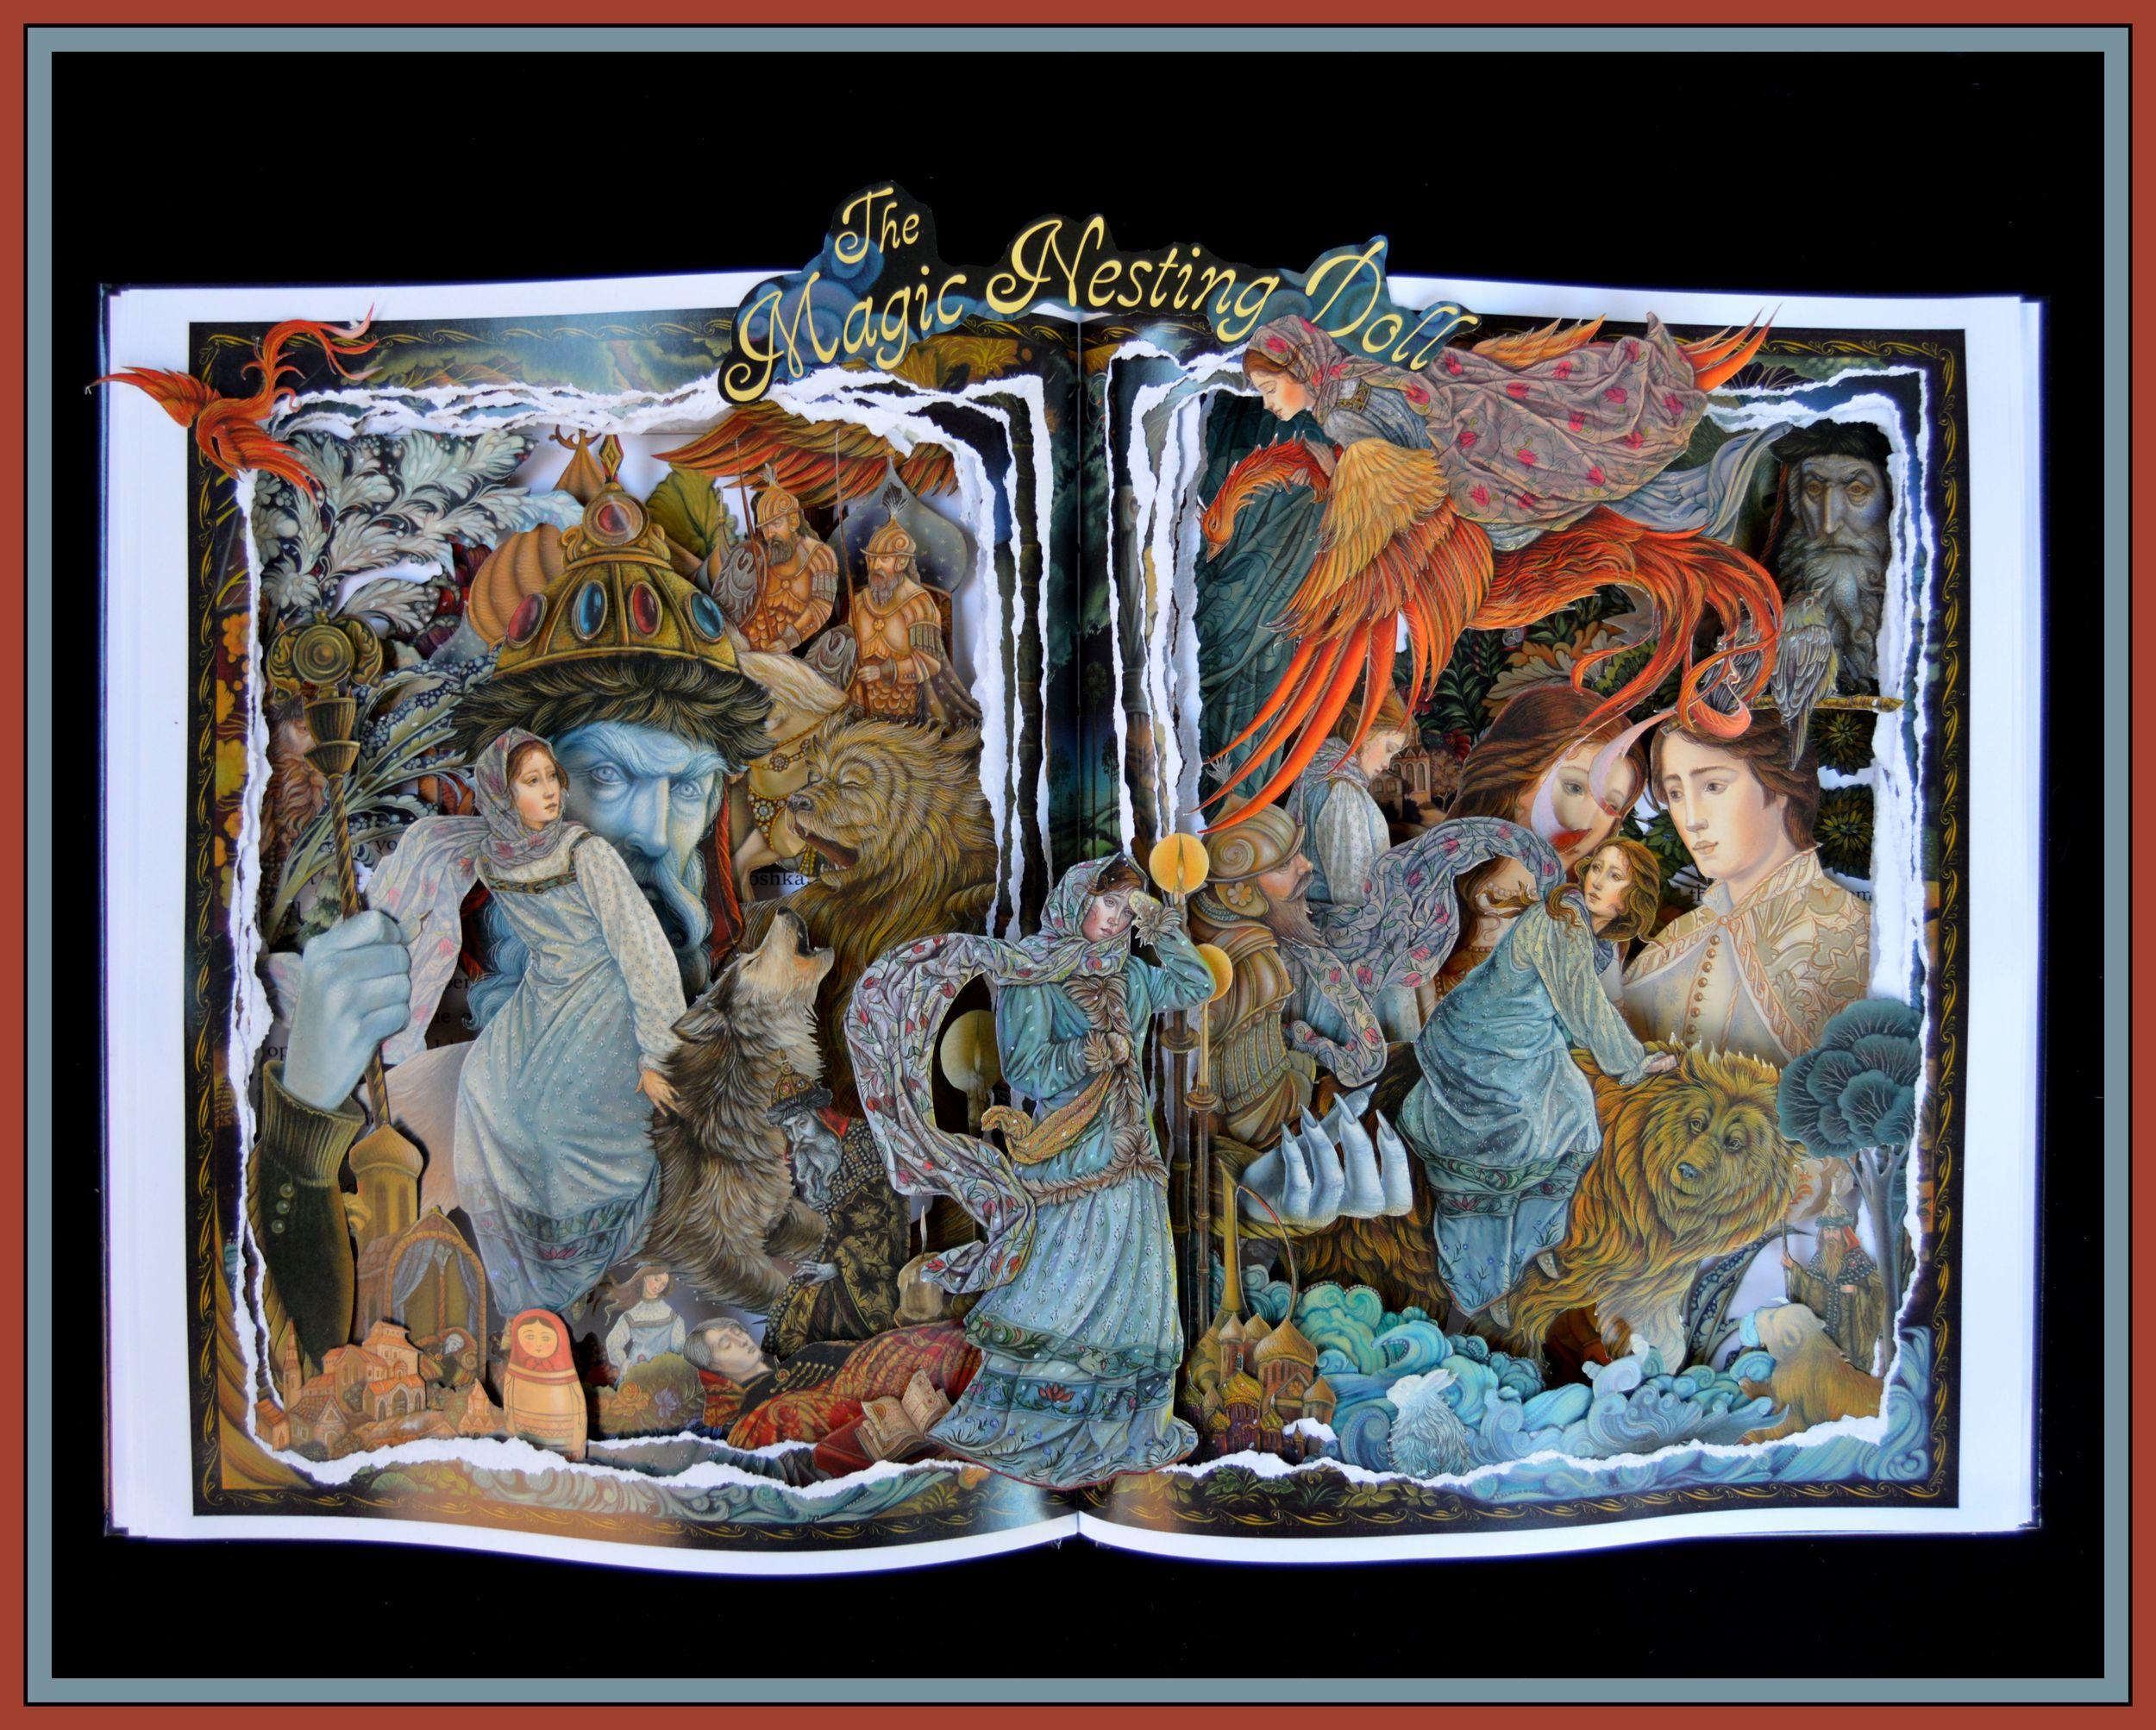 The Magic Nesting Doll - 16x20x3 Book Sculpture